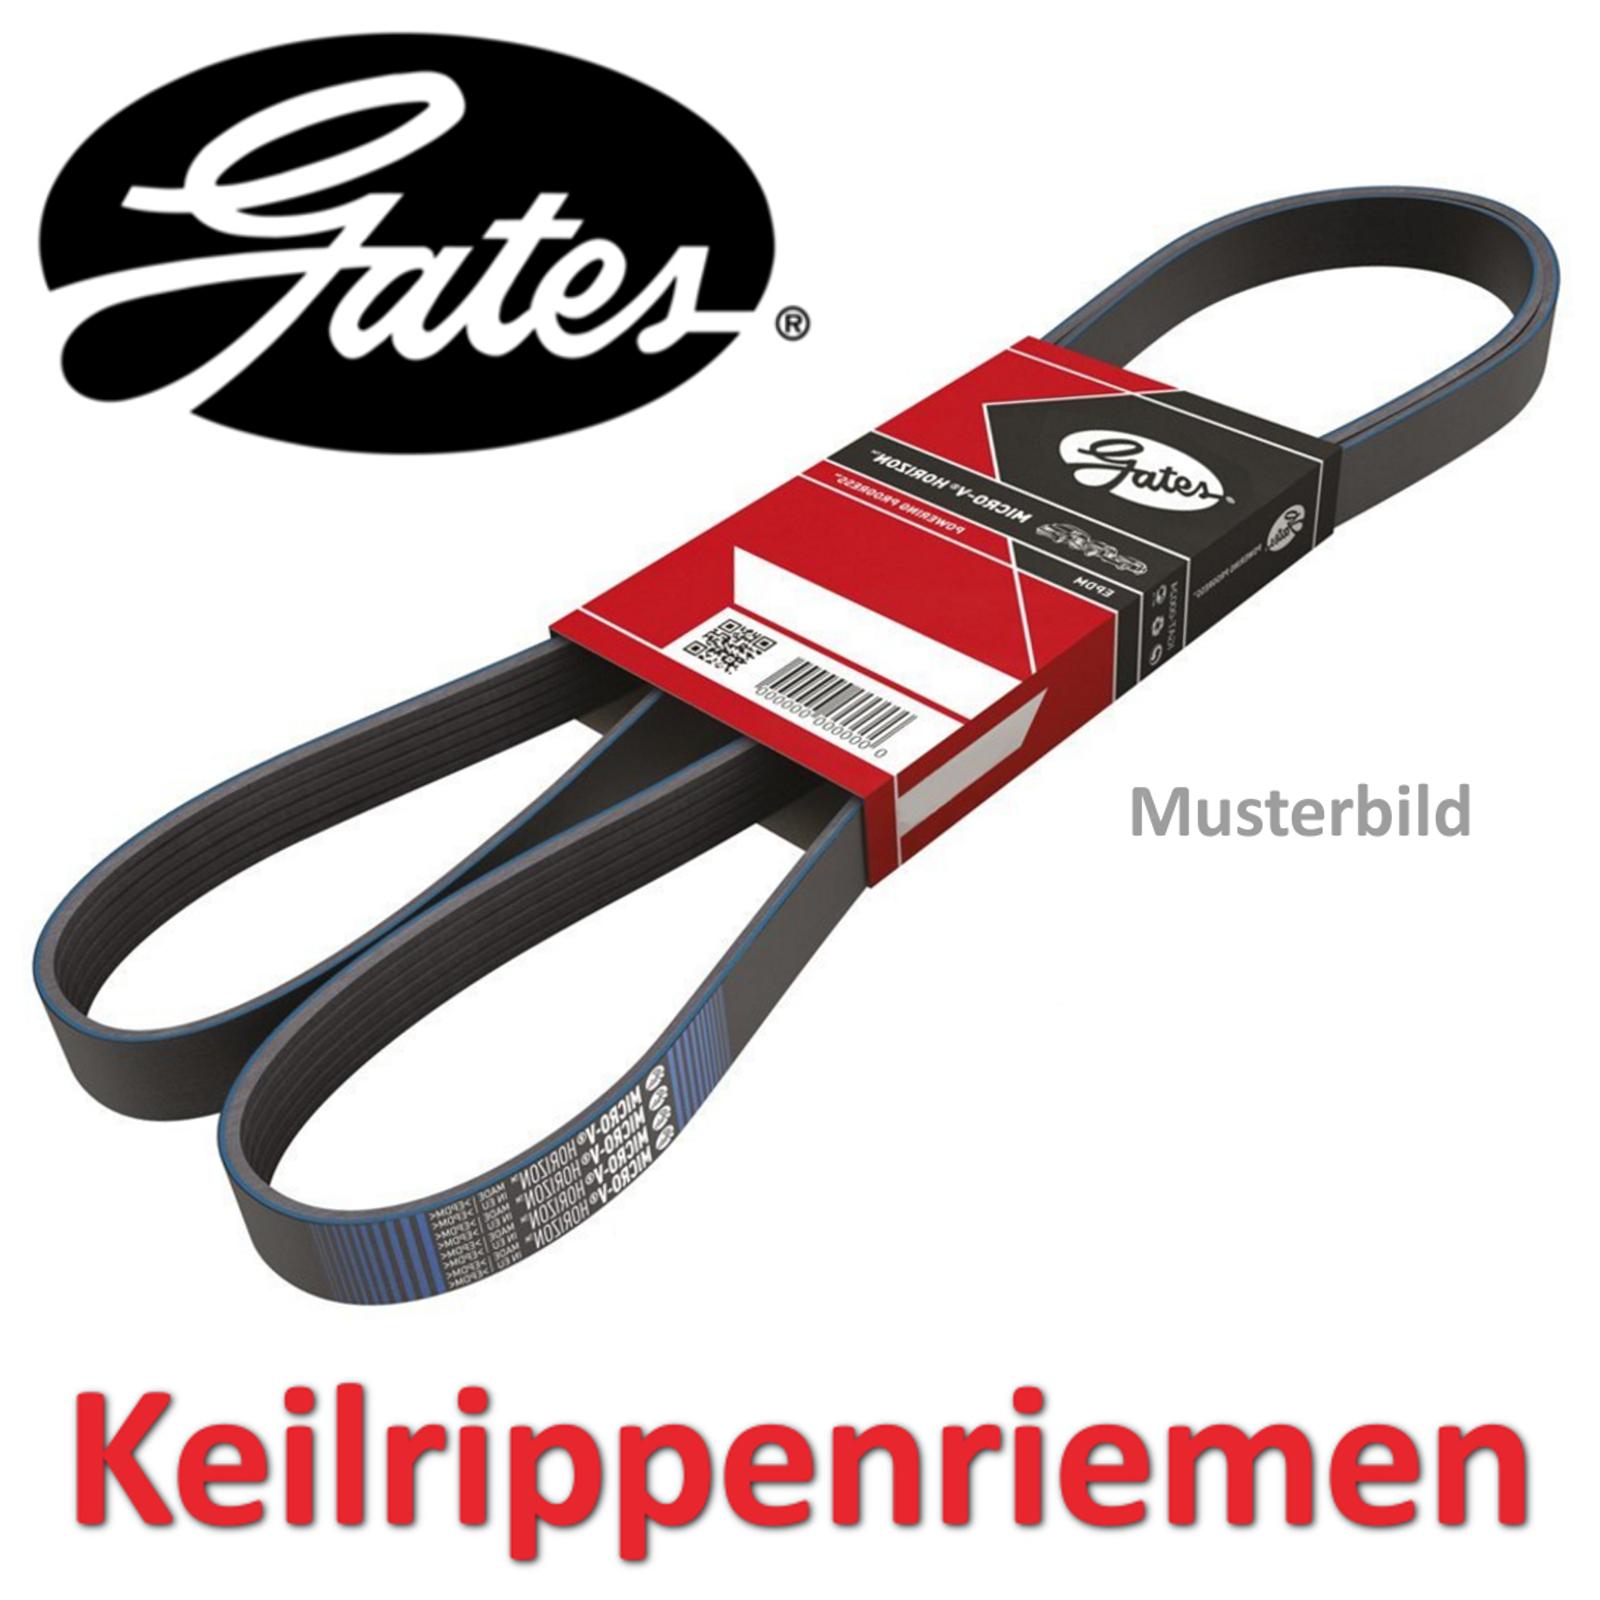 GATES Keilrippenriemen Keilriemen ALPINE RENAULT 5PK1452 5PK1440